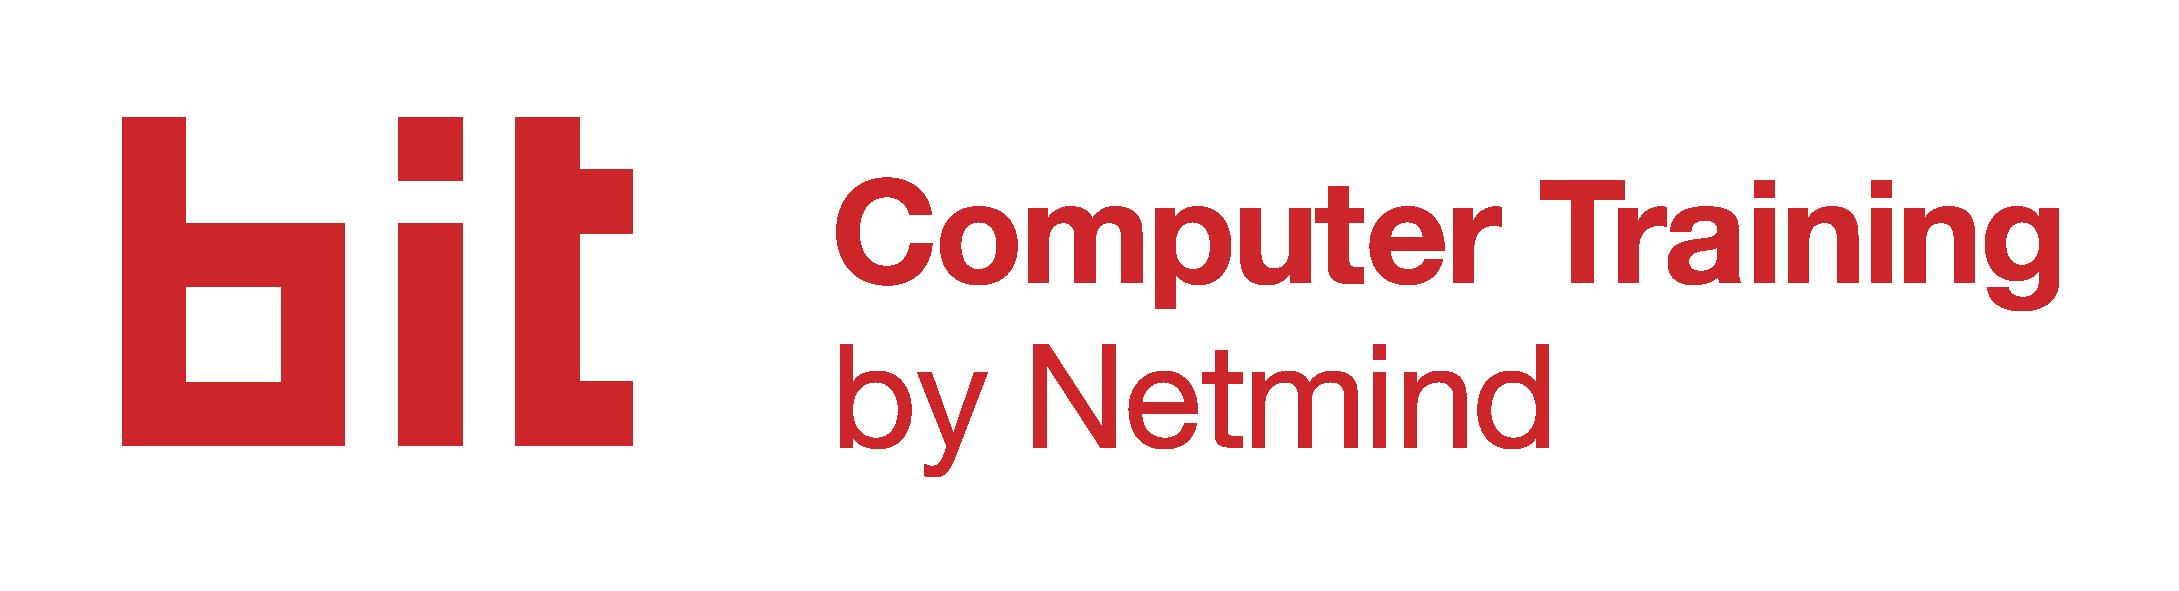 BIT-by-Netmind-1-logo